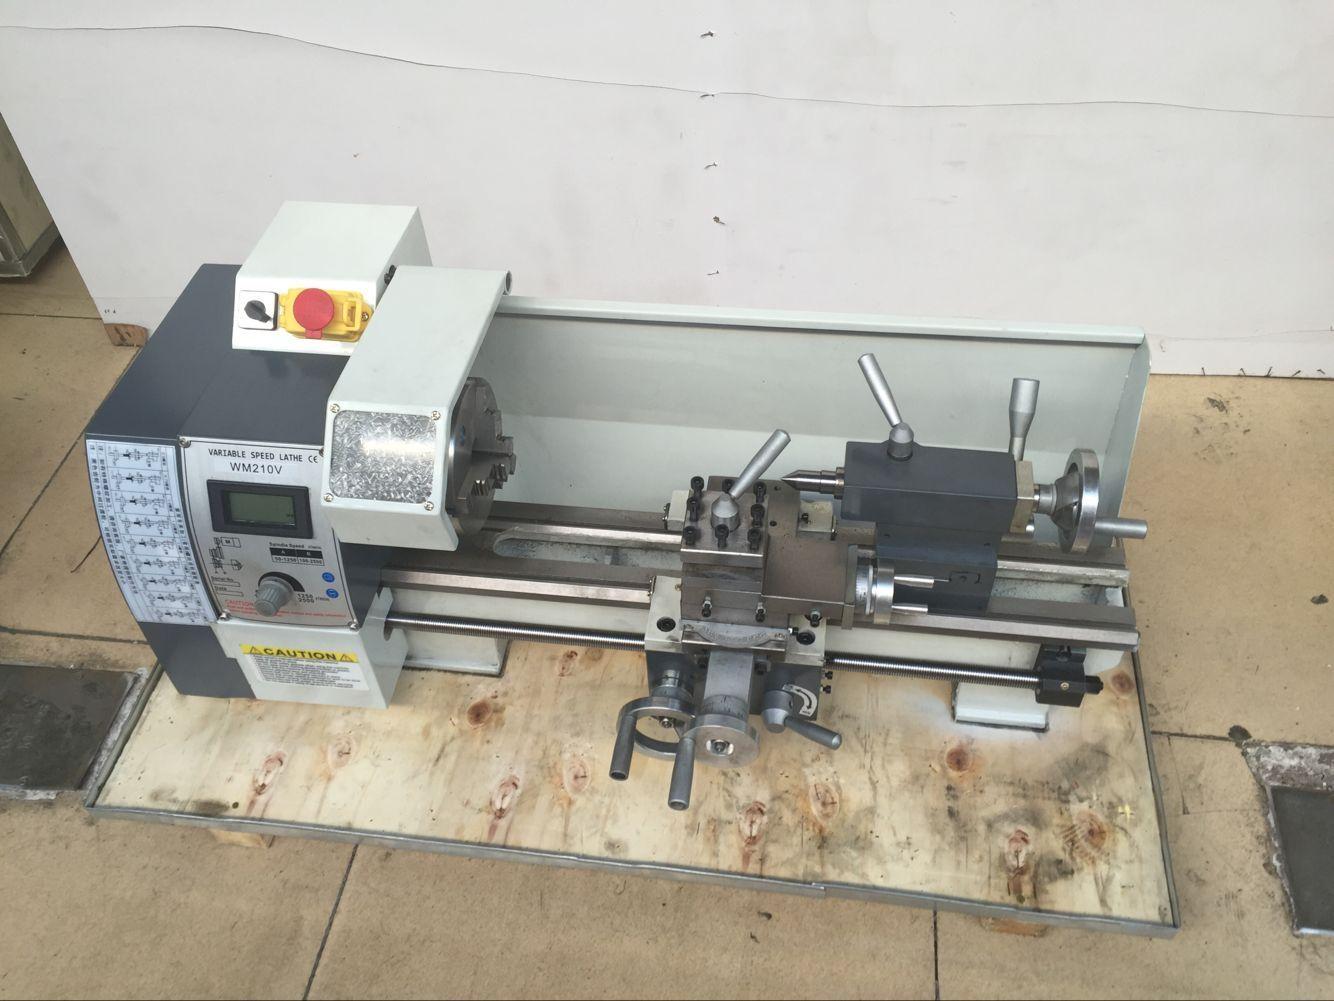 Newest 850w Variable Speed Mini Metal Lathe Machine Wm210v 38 Small